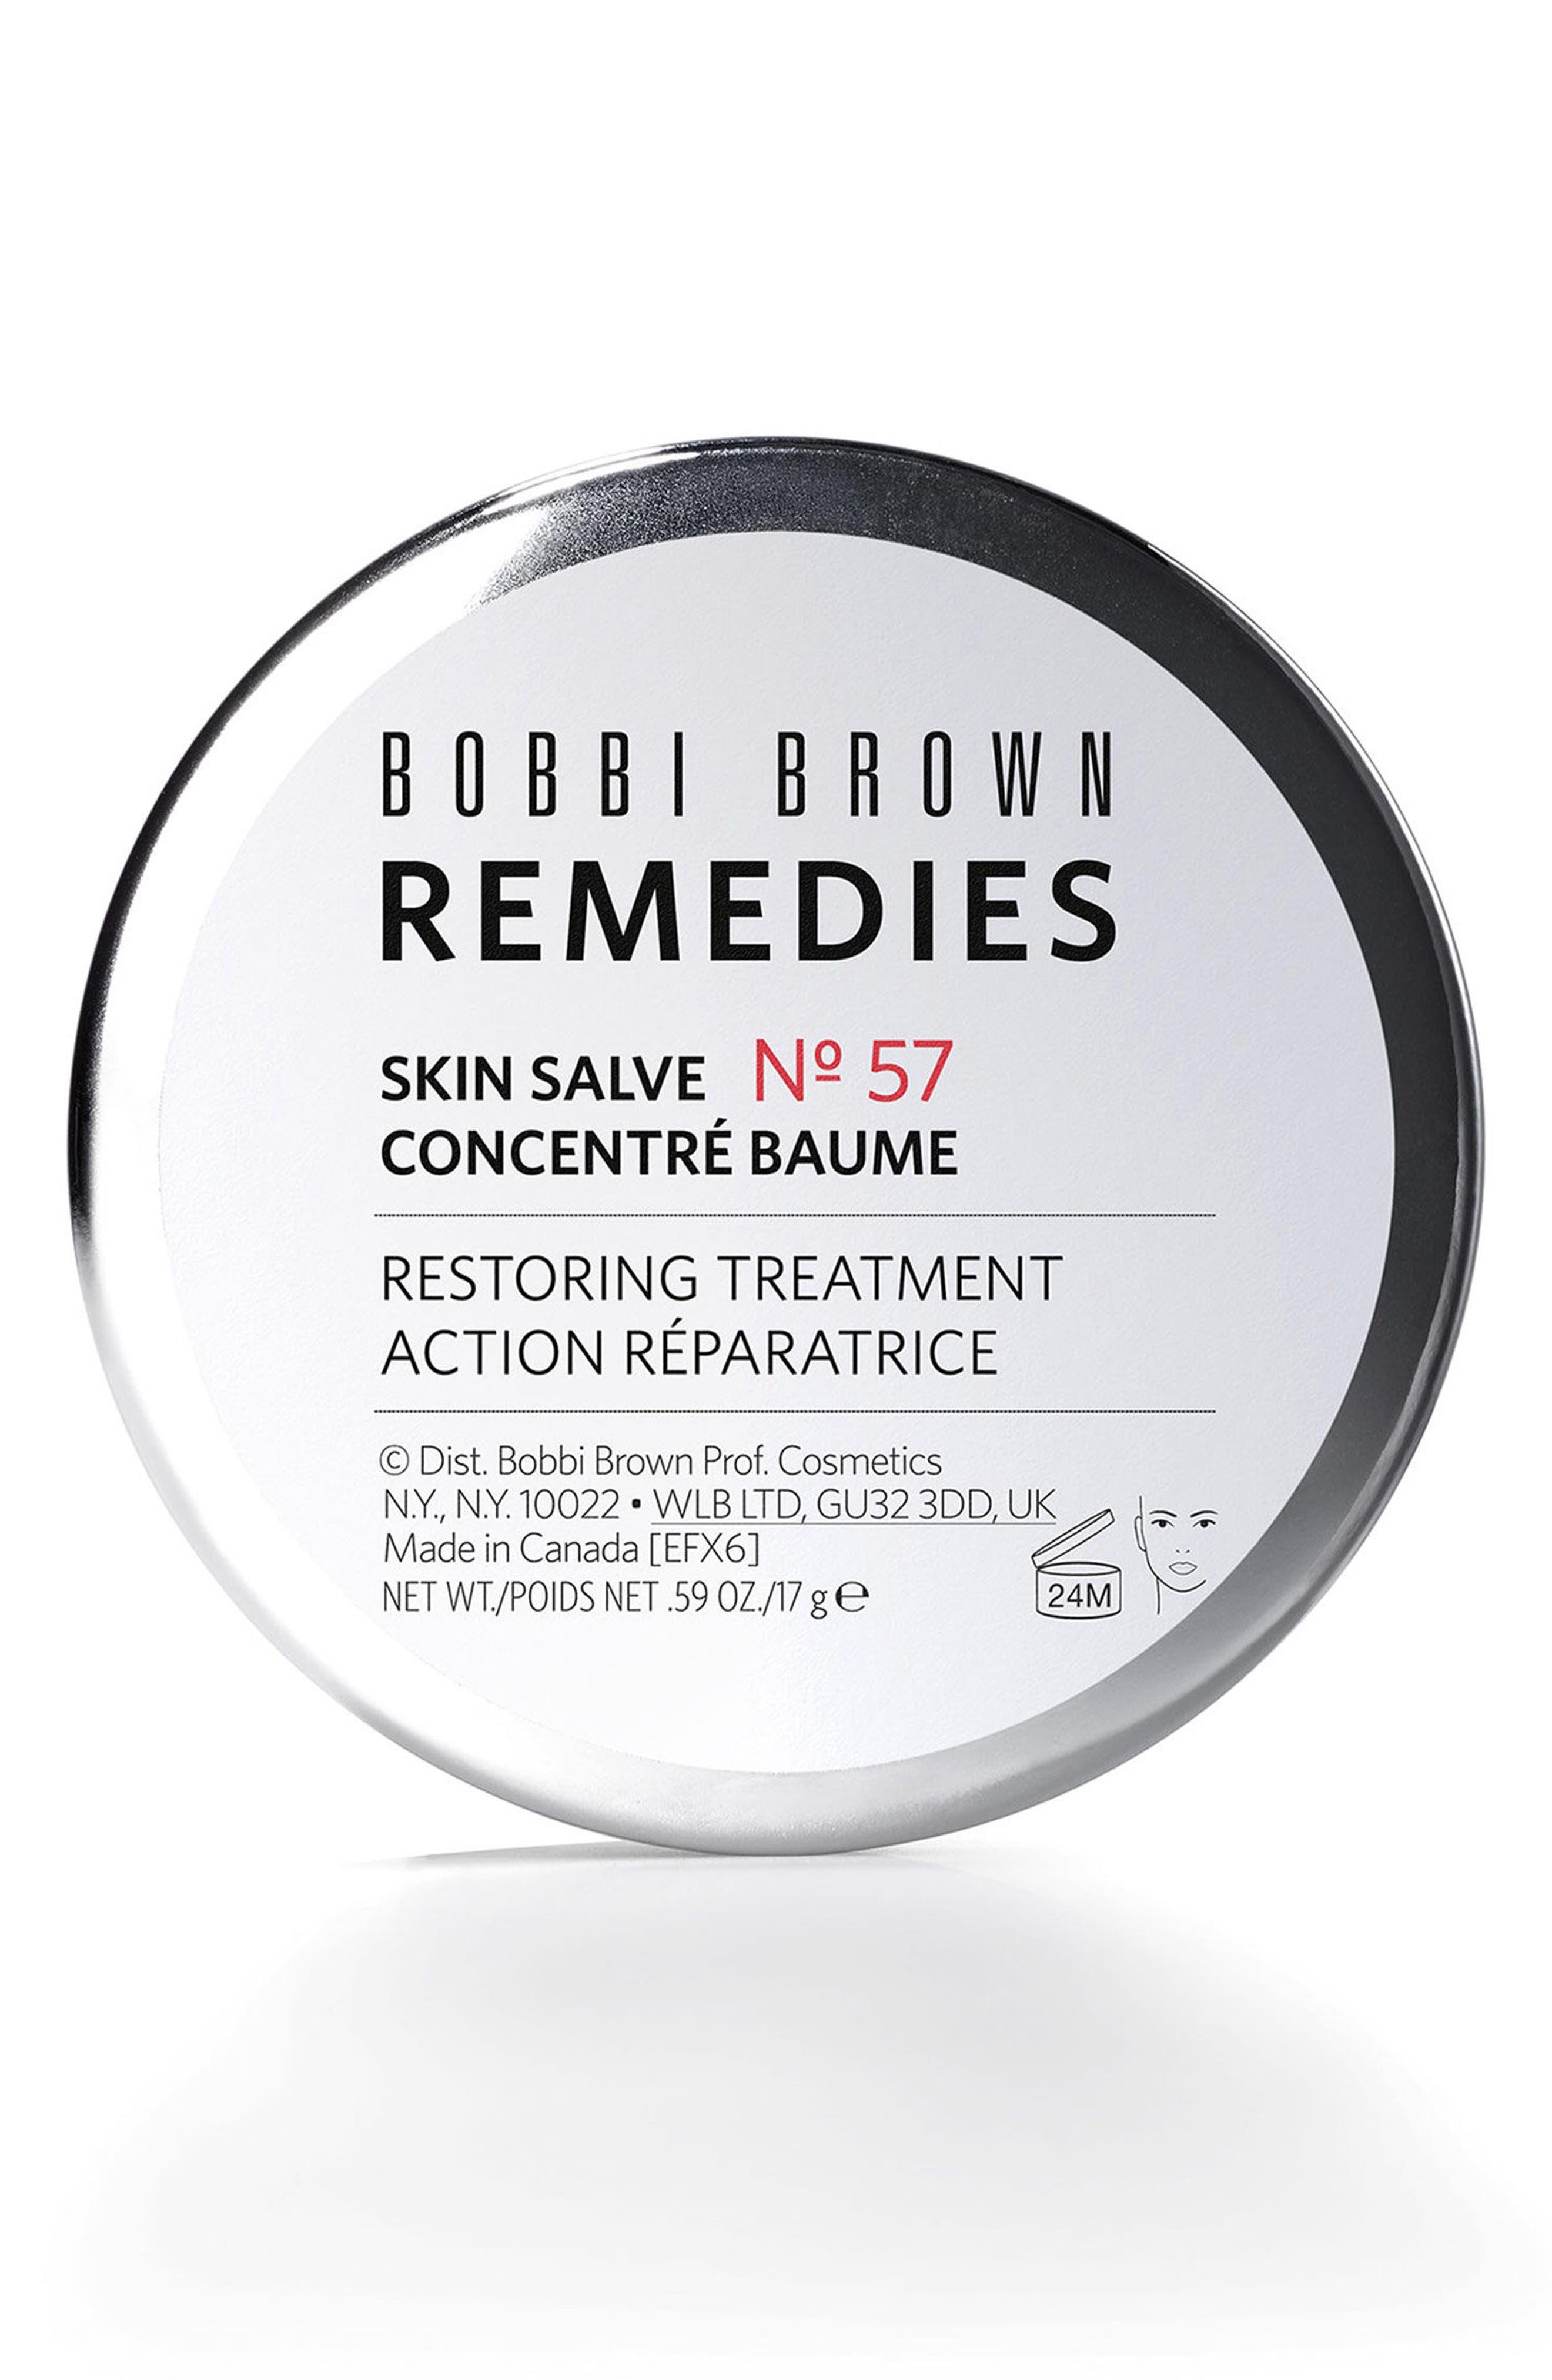 BOBBI BROWN Remedies Skin Salve Restoring Treatment